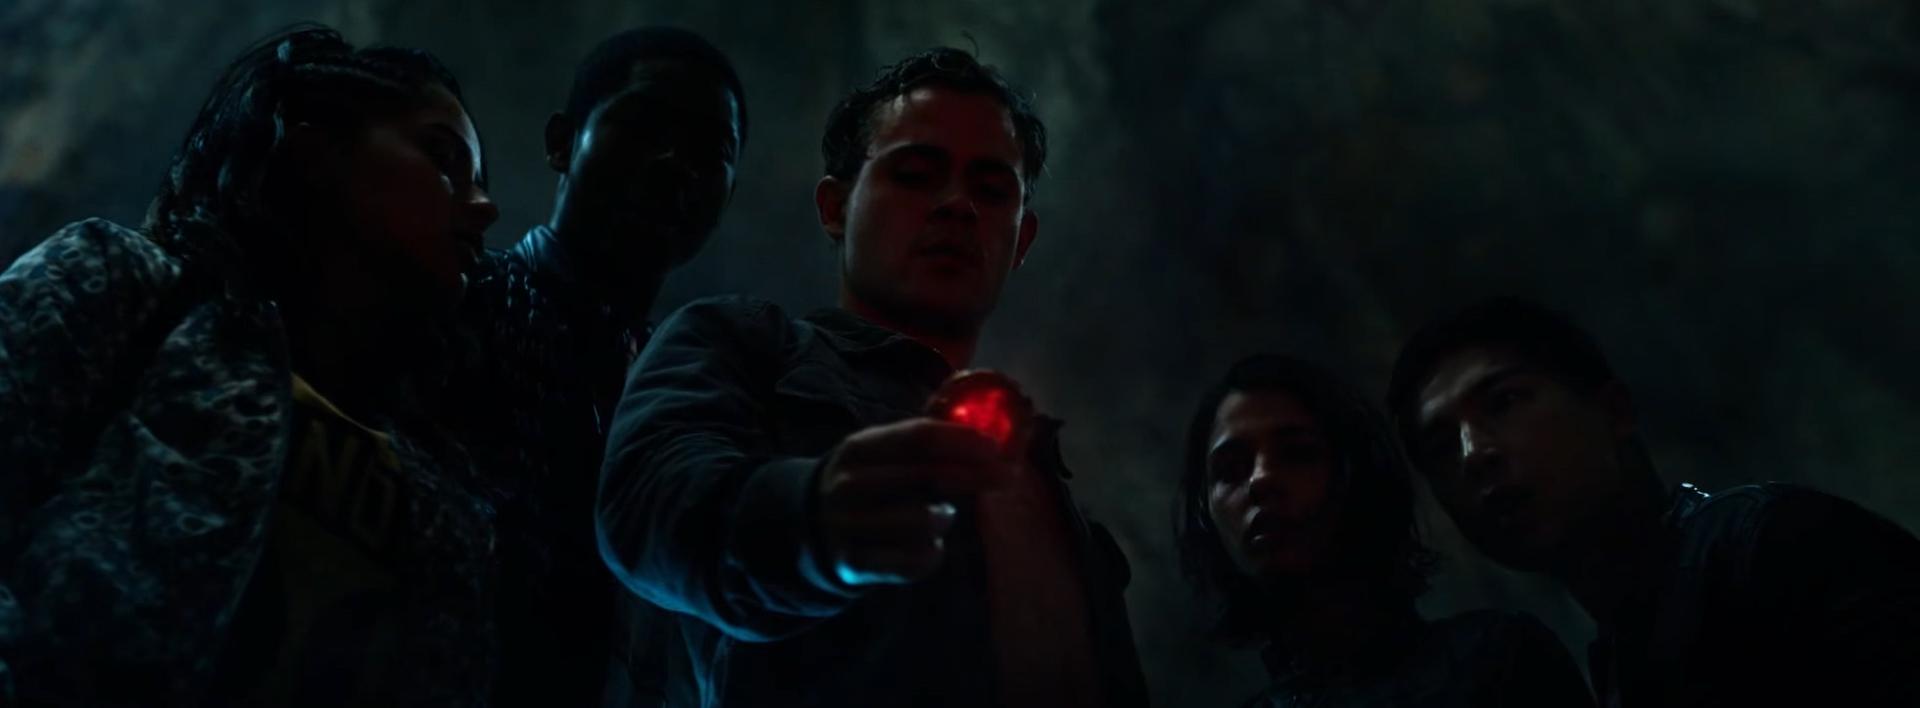 Power Rangers. Image Credit: Lionsgate.